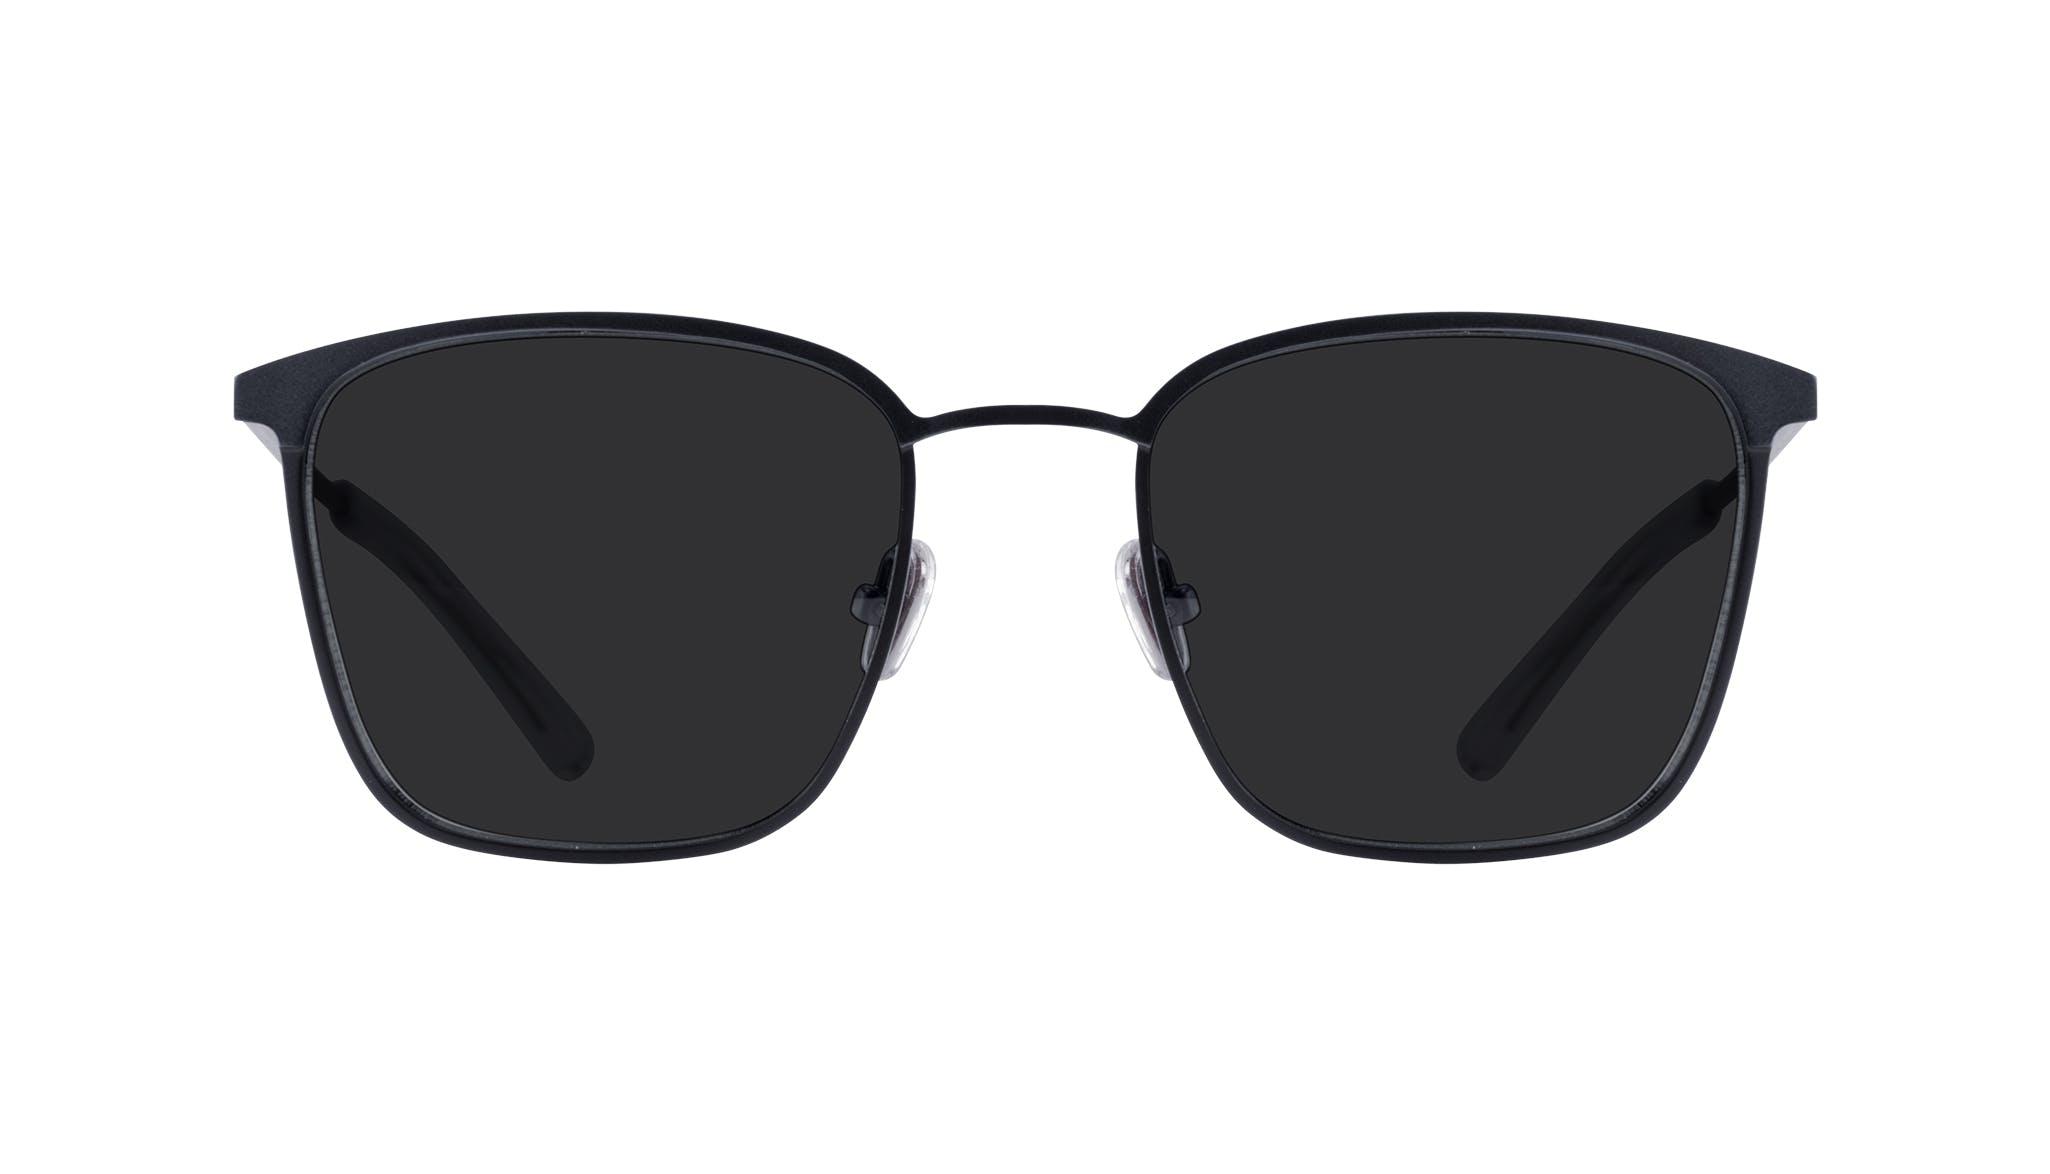 Affordable Fashion Glasses Rectangle Sunglasses Men Rove Midnight